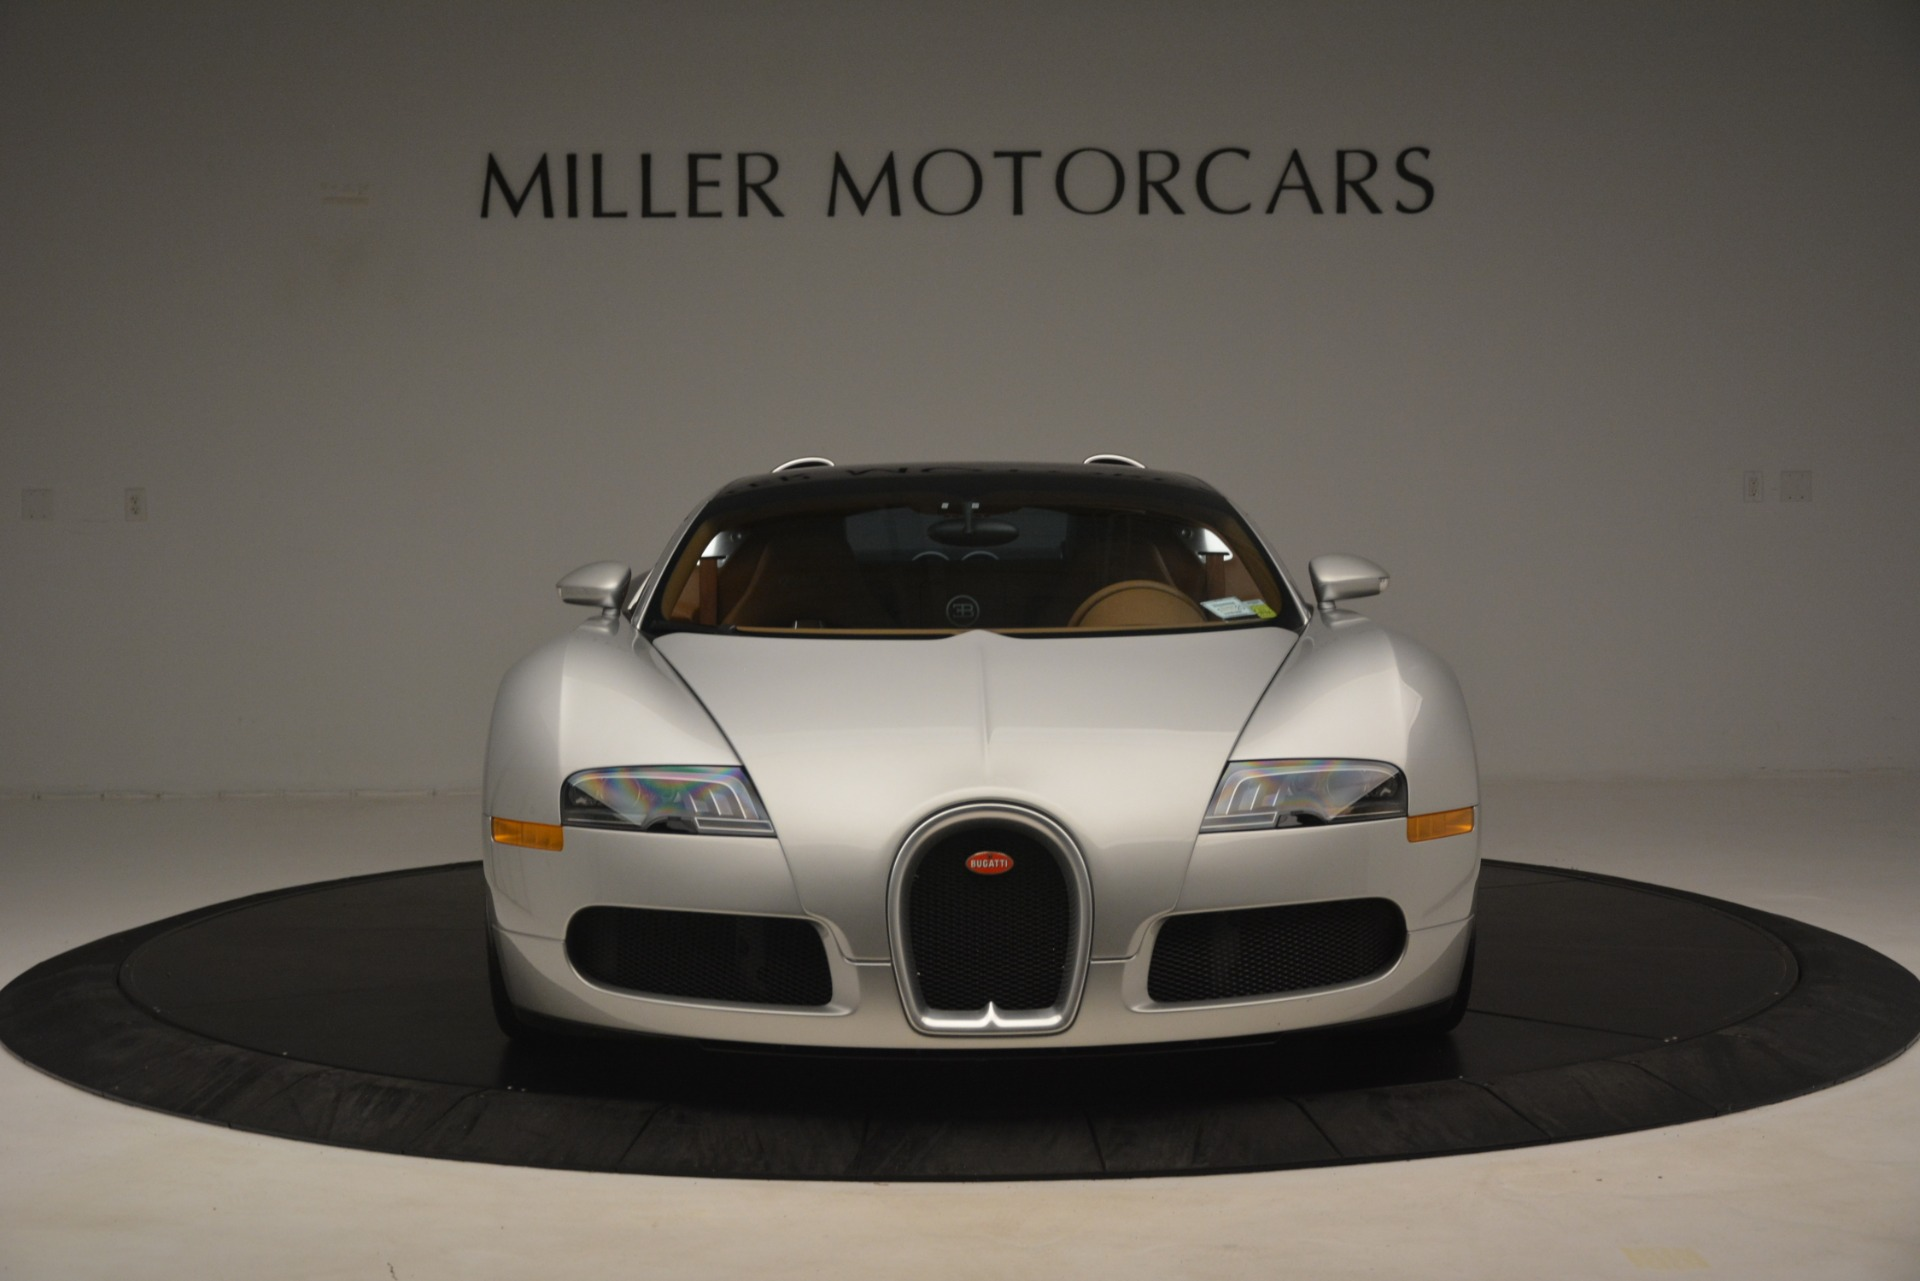 Used 2010 Bugatti Veyron 16.4 Grand Sport For Sale In Greenwich, CT 3159_p22